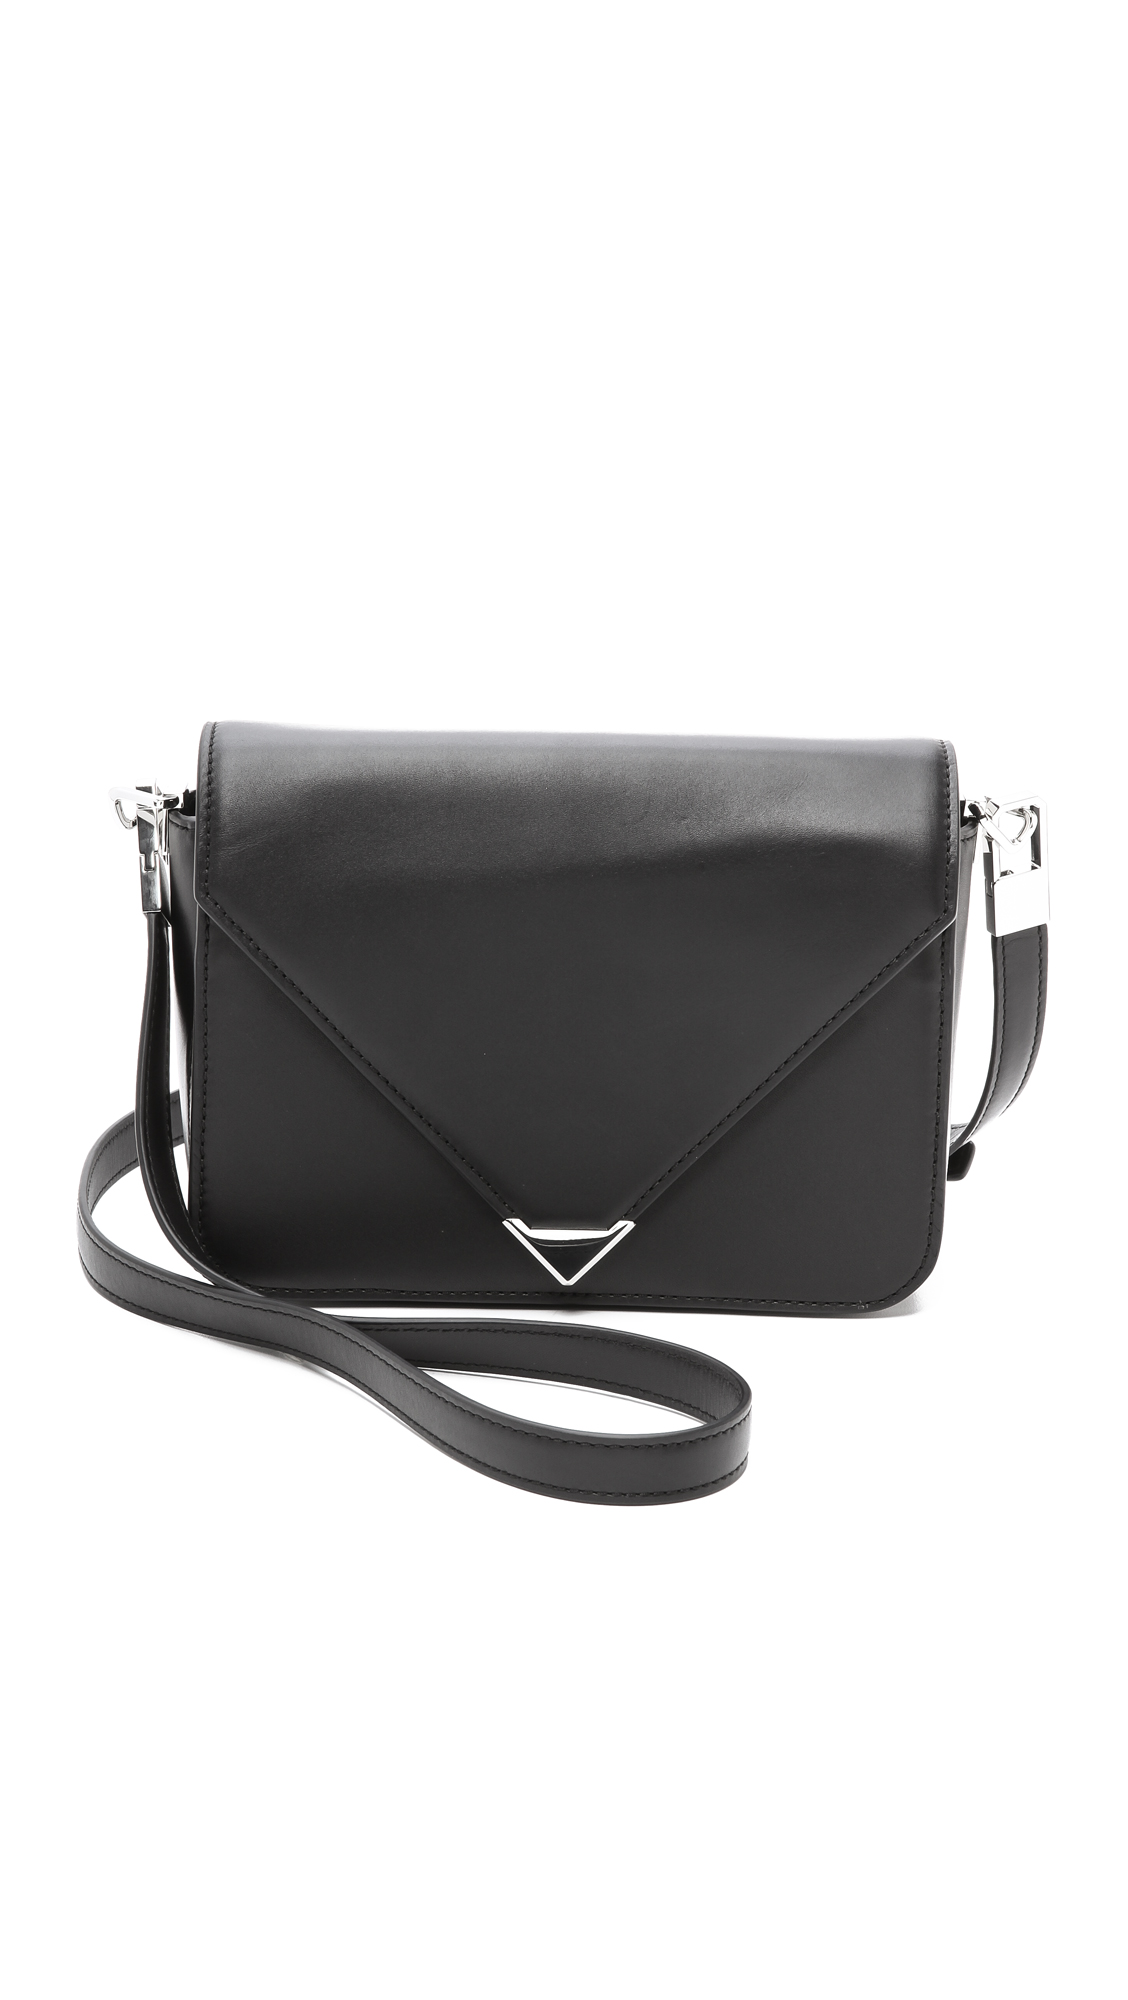 cfe426ff81124 Buy alexander wang Prisma Envelope Small Sling Bag (black ...